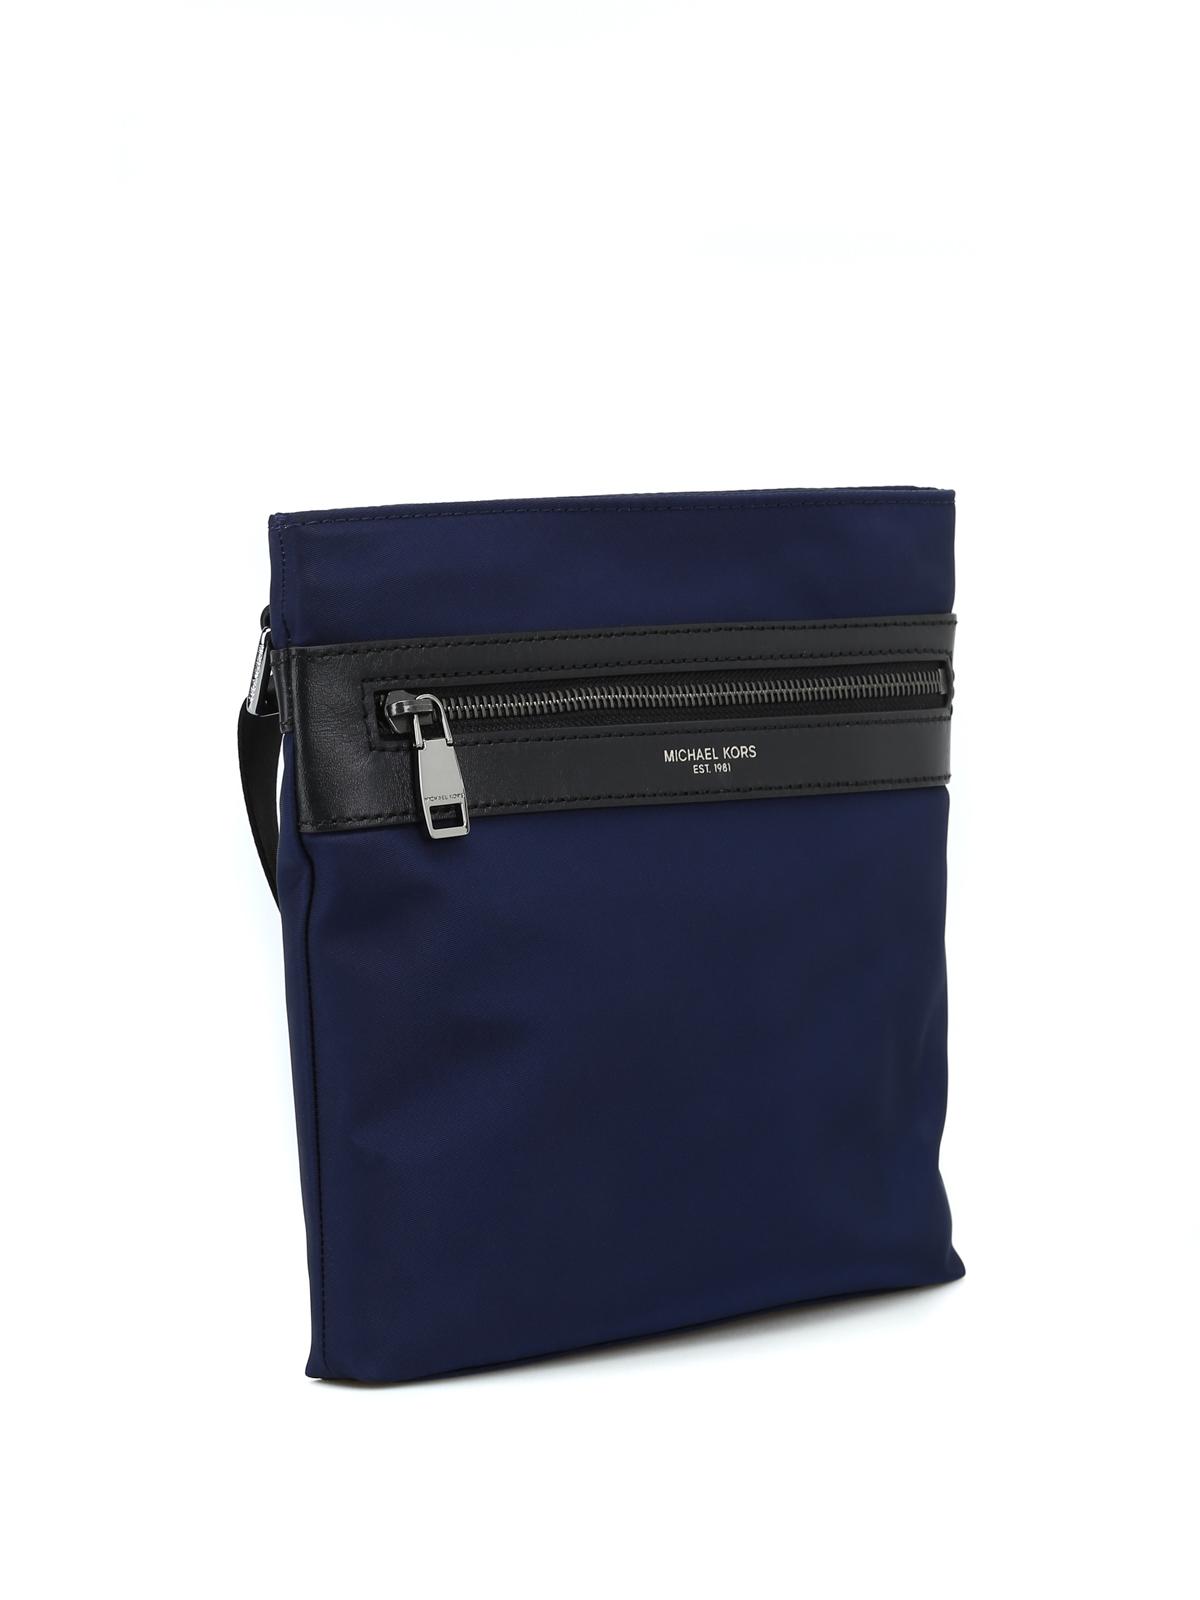 597c9a1e4619 Michael Kors - Blue Kent messenger bag - cross body bags - 33S6LKNC5C401